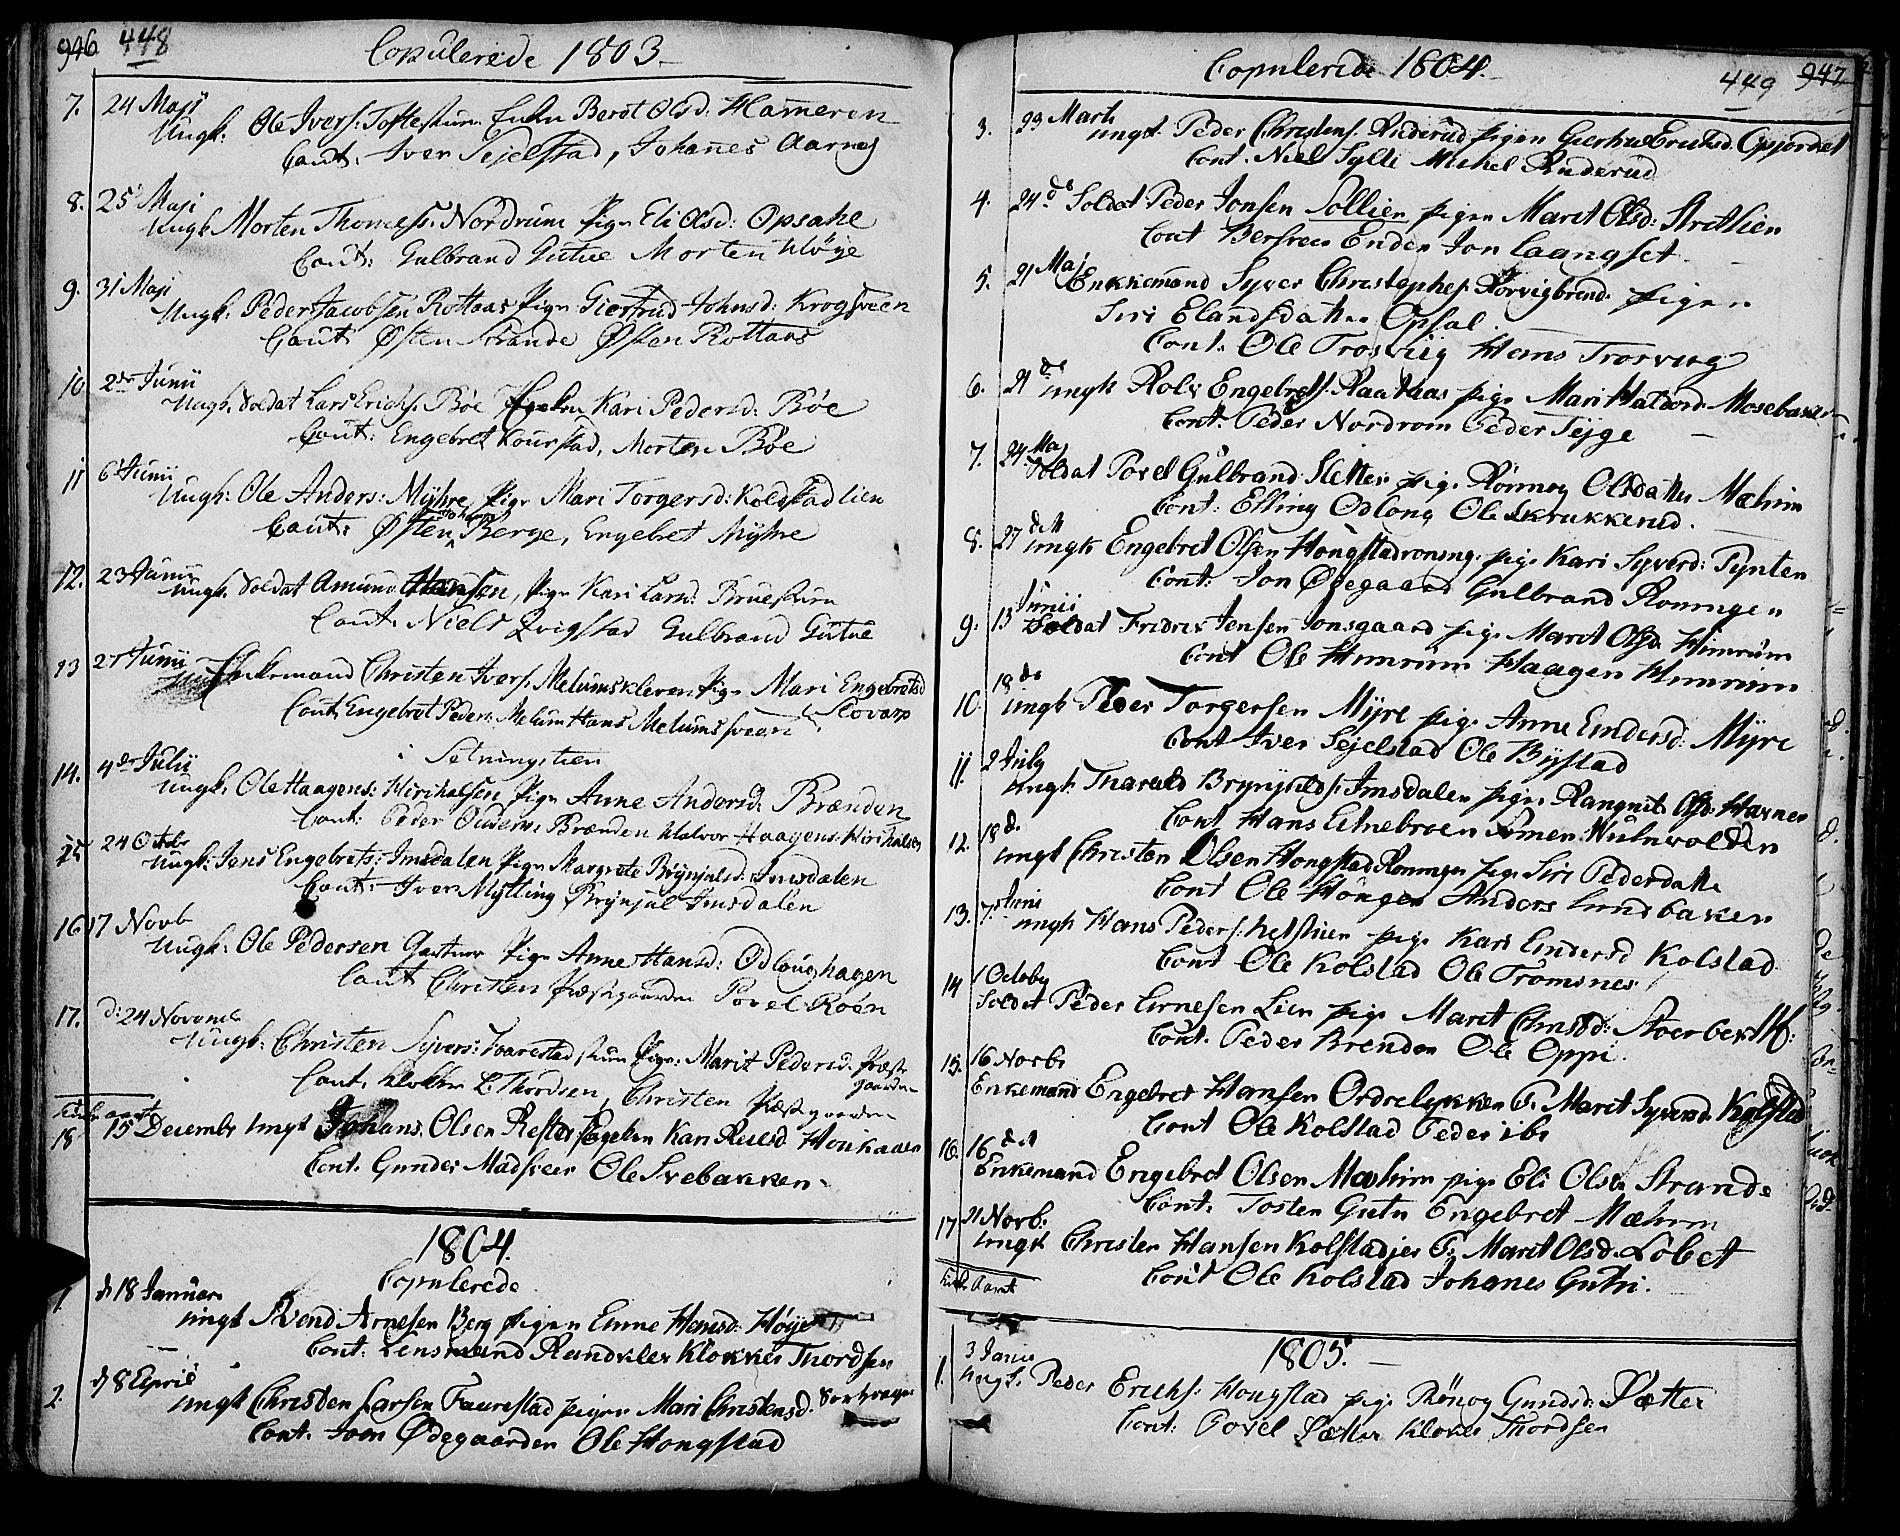 SAH, Ringebu prestekontor, Ministerialbok nr. 3, 1781-1820, s. 448-449